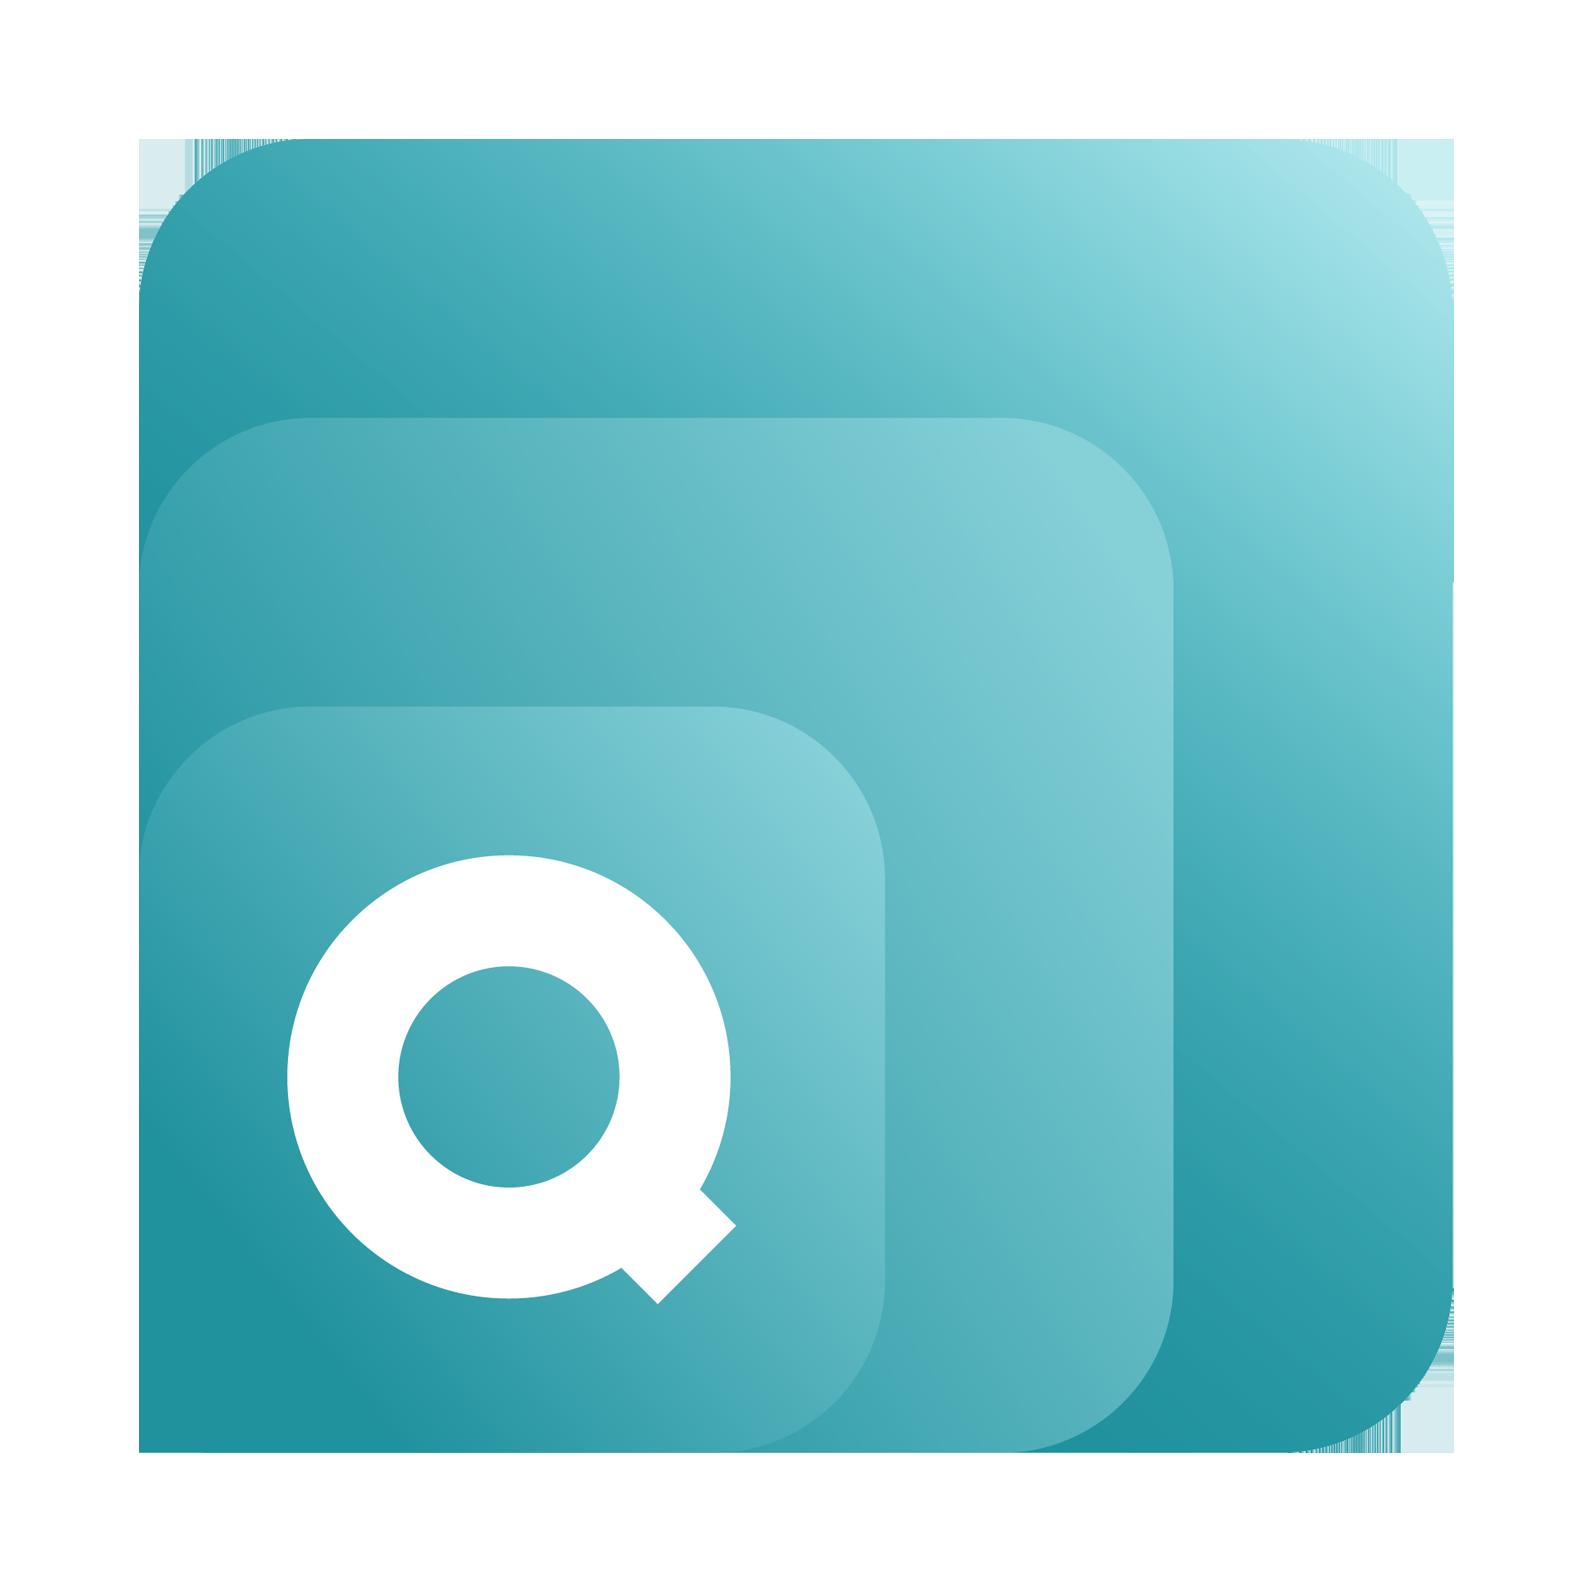 Q-Team Project Dossier App